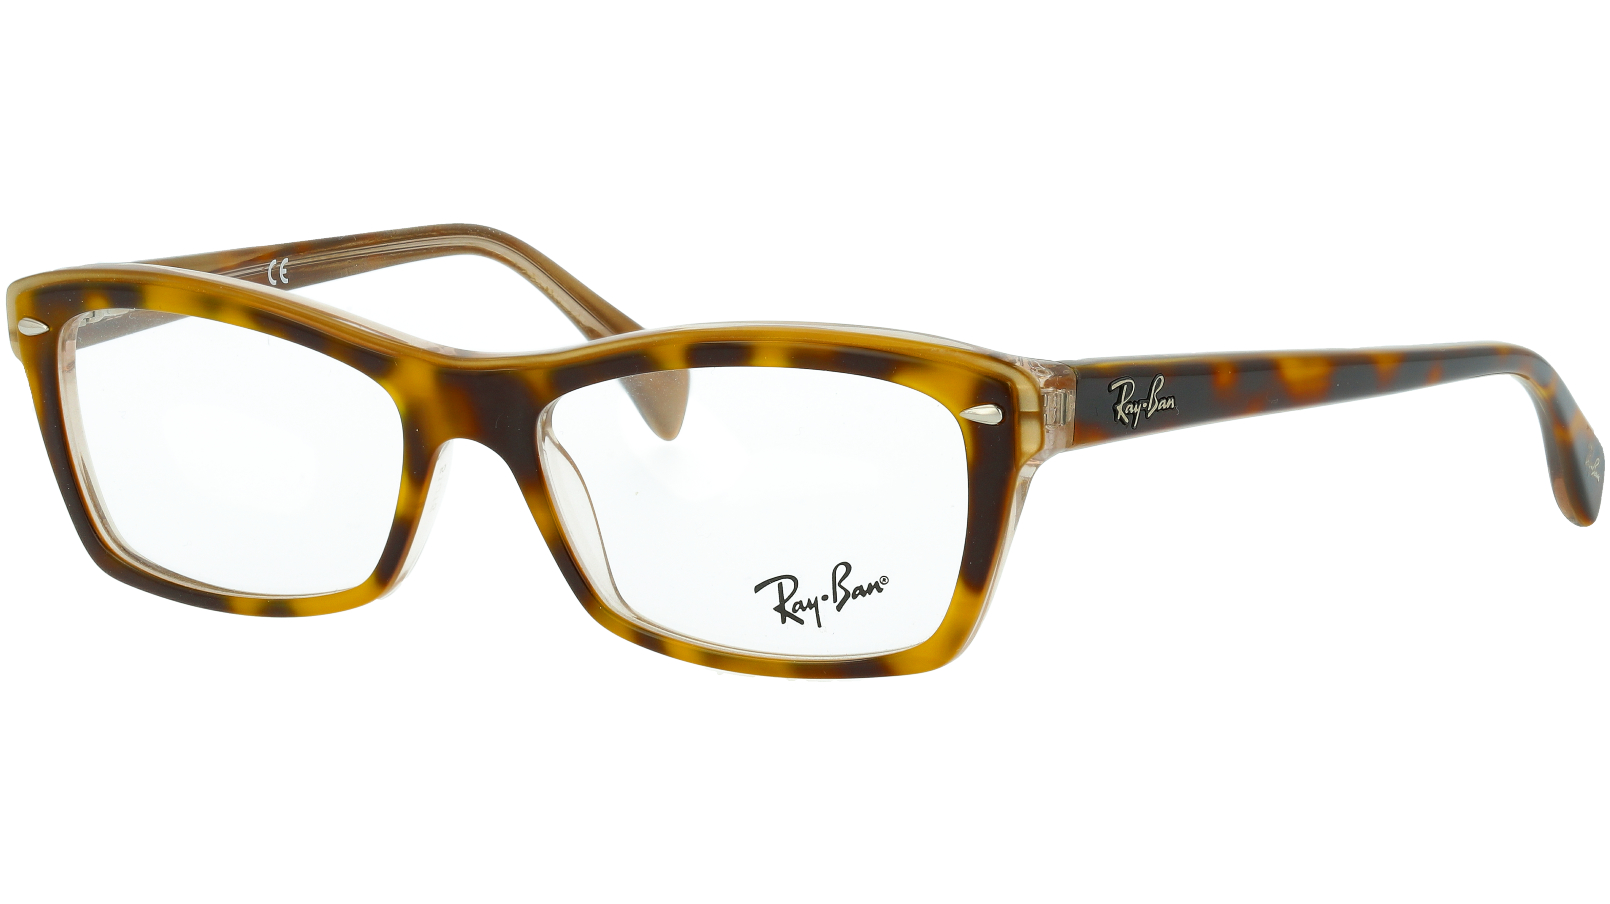 Ray-Ban RB5255 5075 51 HAVANA Glasses